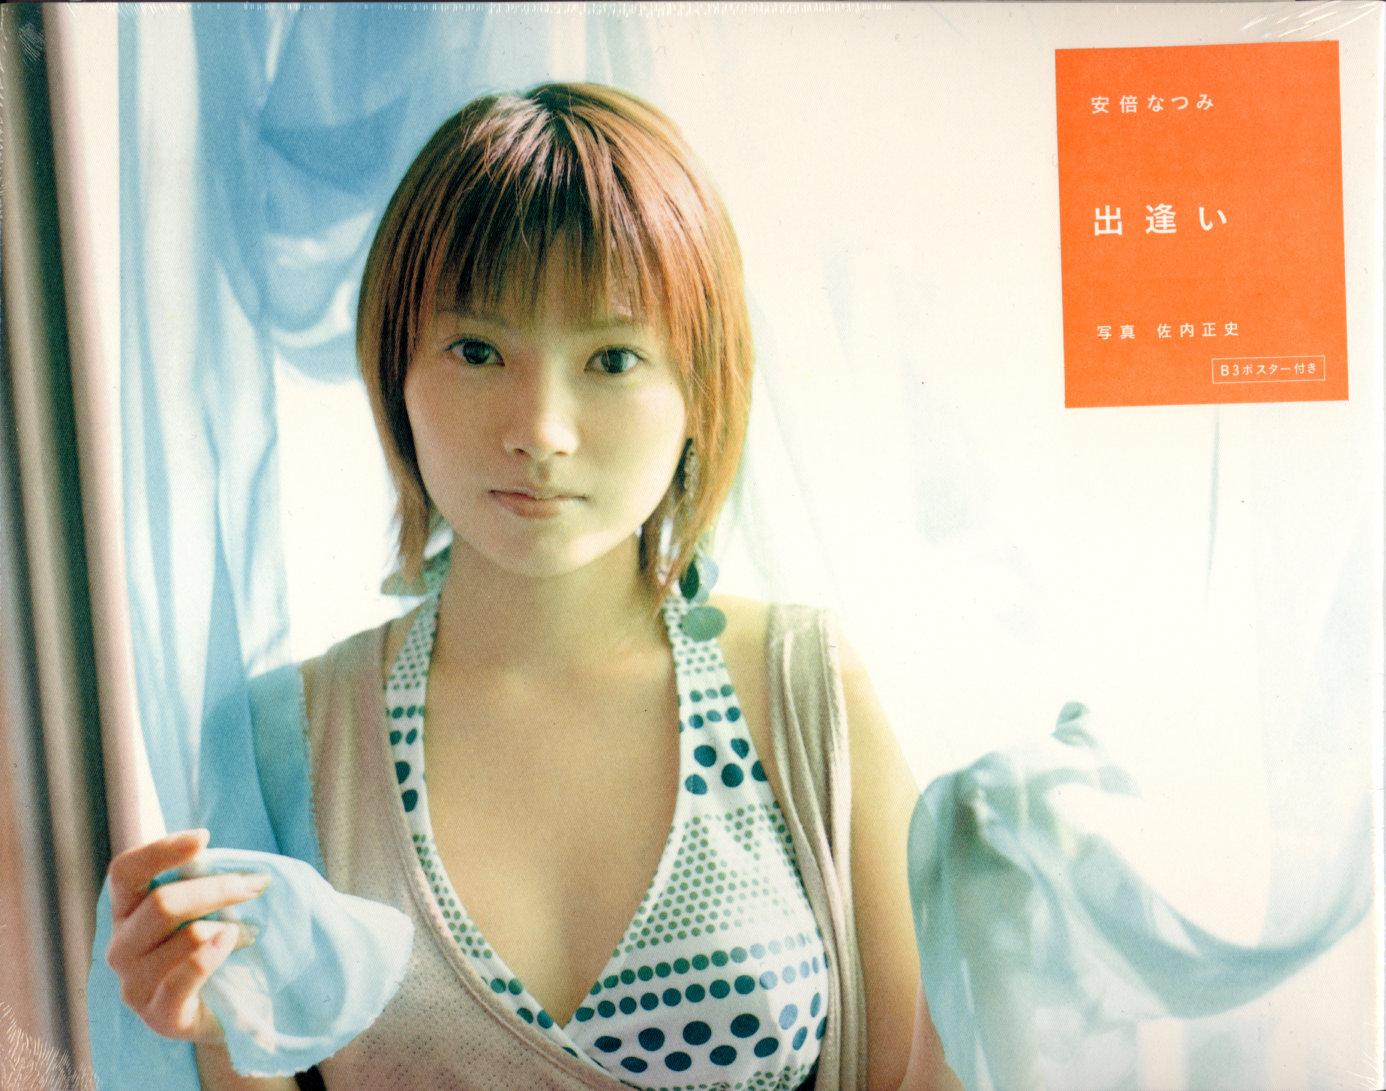 20151209.10.02 Abe Natsumi - Deai (photobook) (2004) 001 (JPOP.ru).jpg